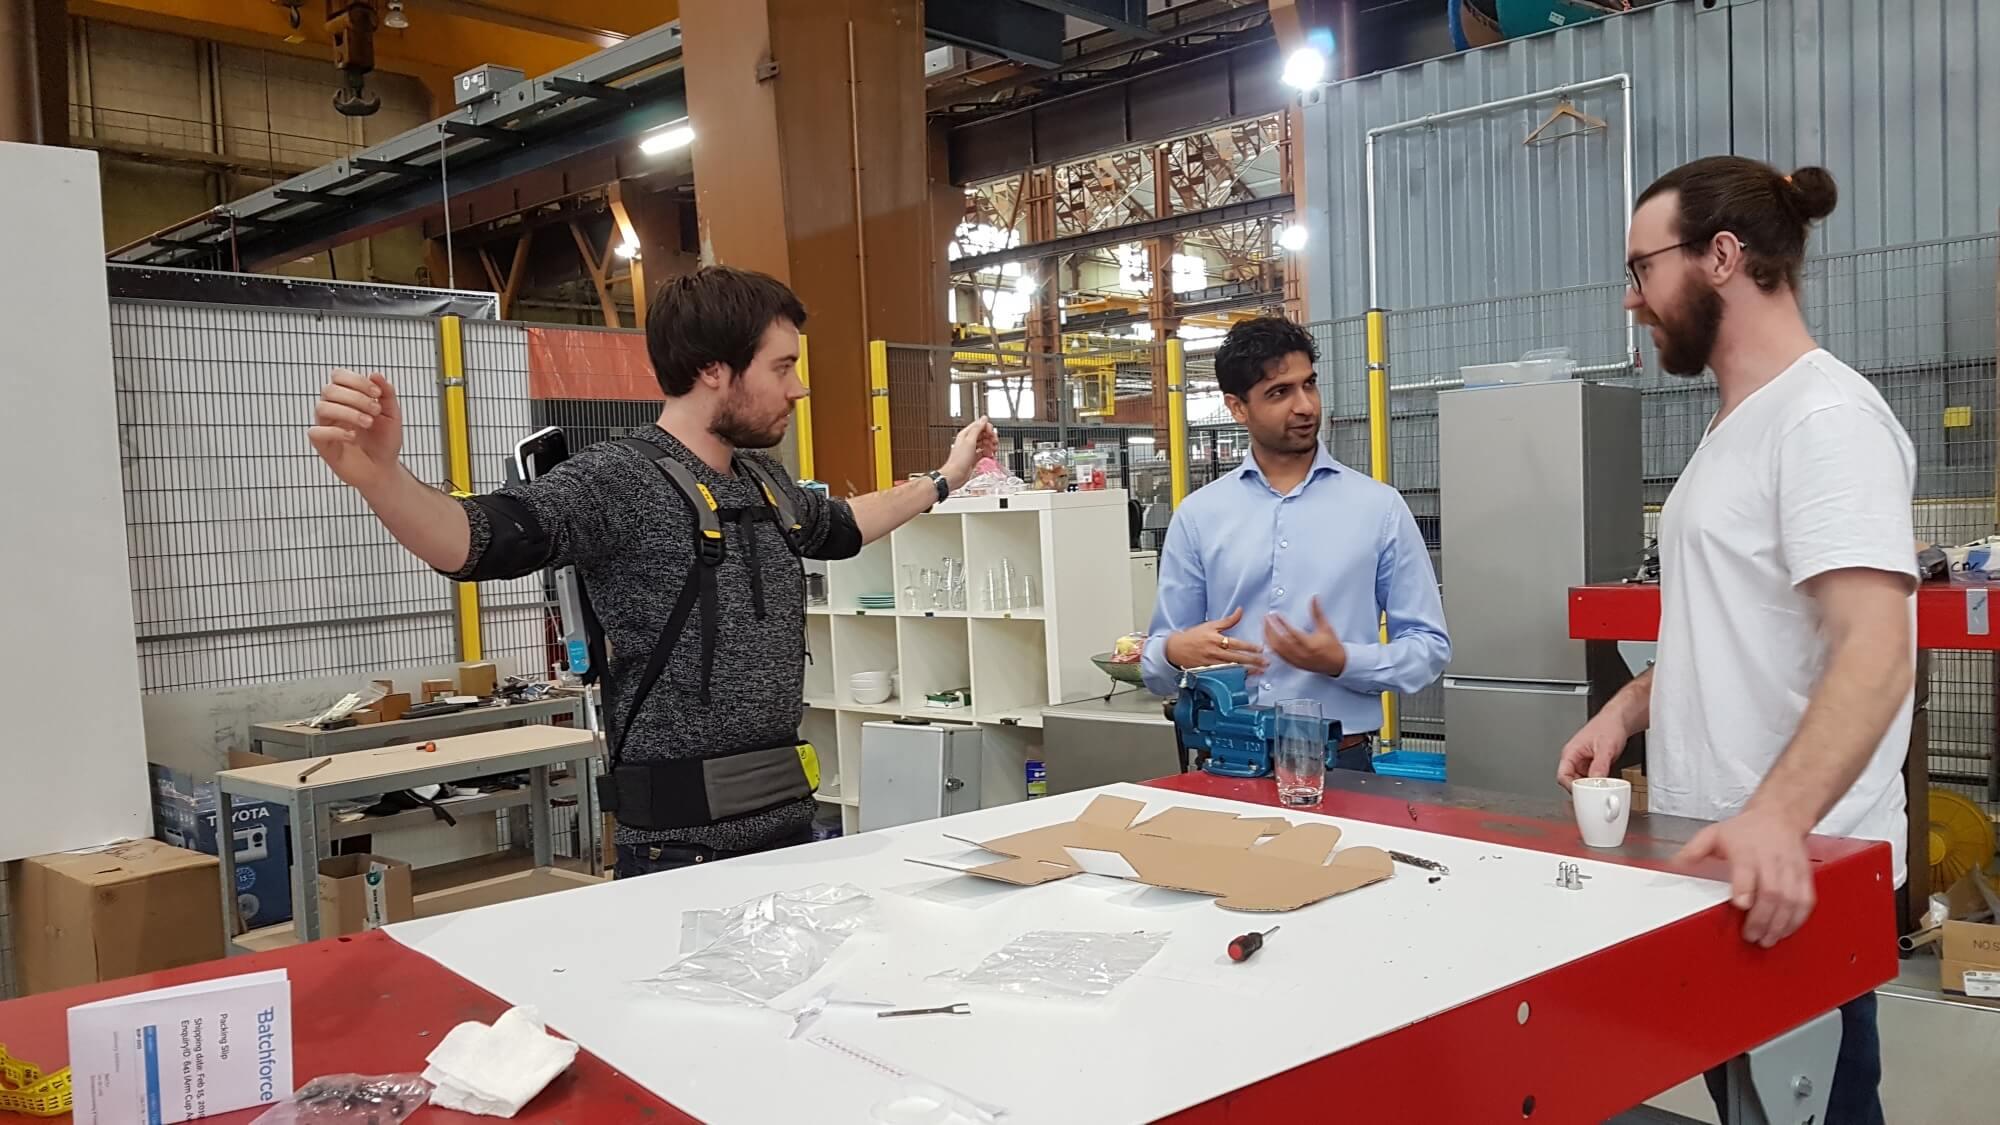 Gaurav and the Skelex team discuss future developments to the exoskeleton.